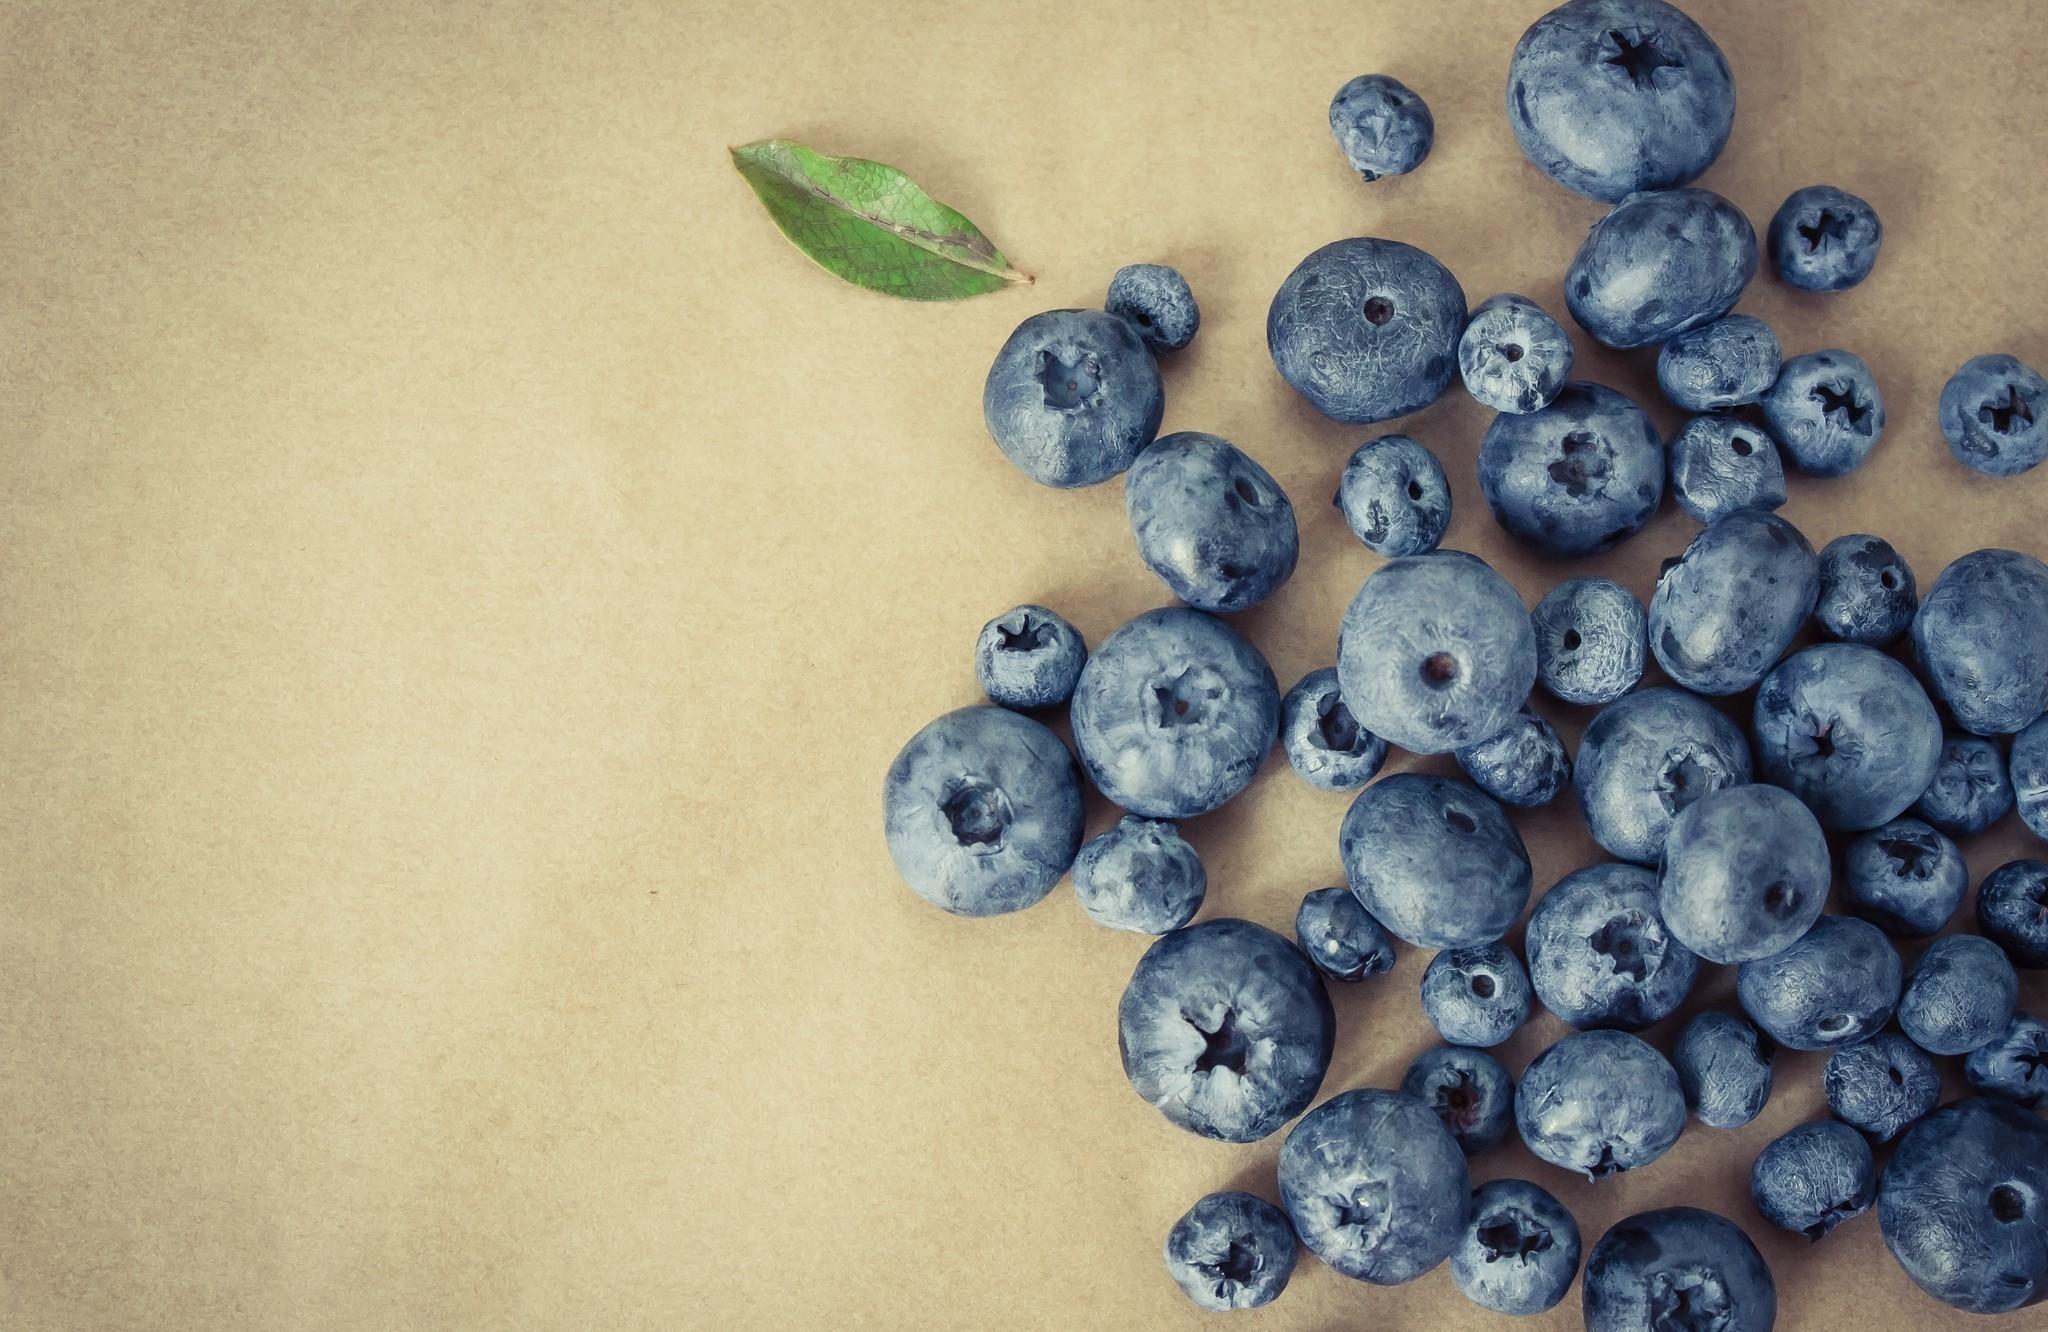 Food Blueberry 2048x1332